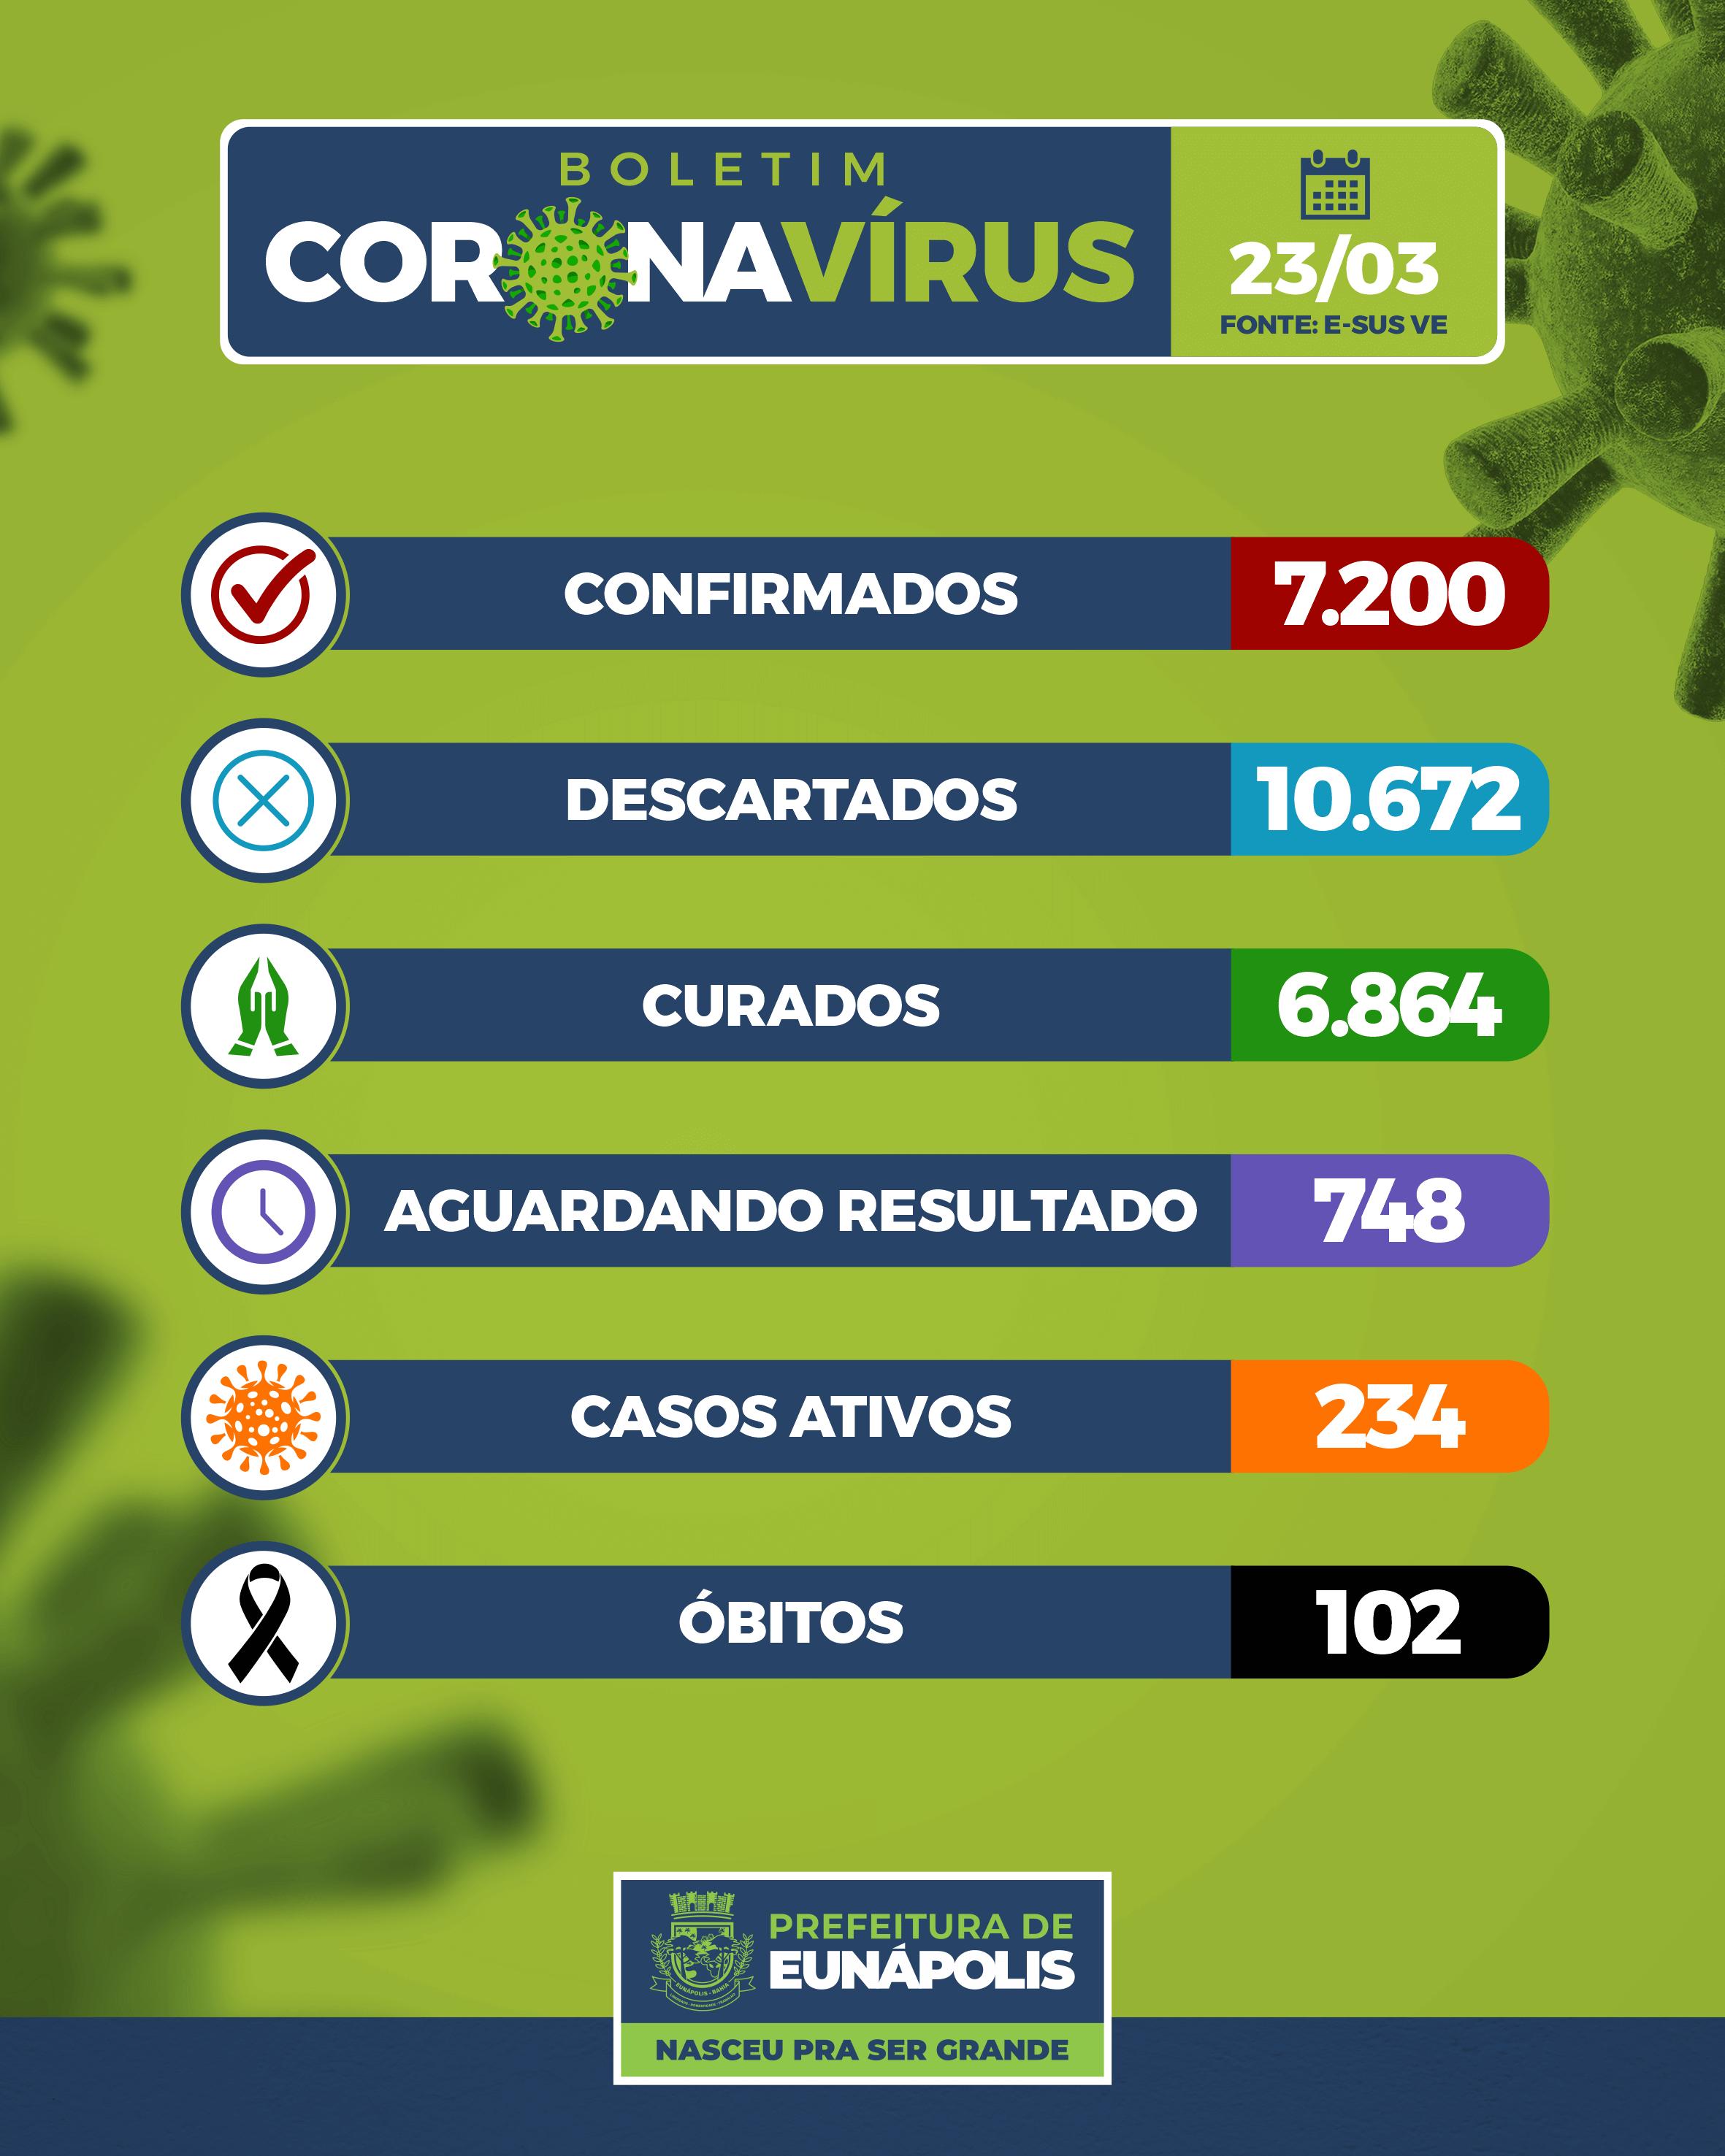 Boletim Epidemiológico Coronavírus do Município de Eunápolis para a data de hoje, 23/03/2021. 18